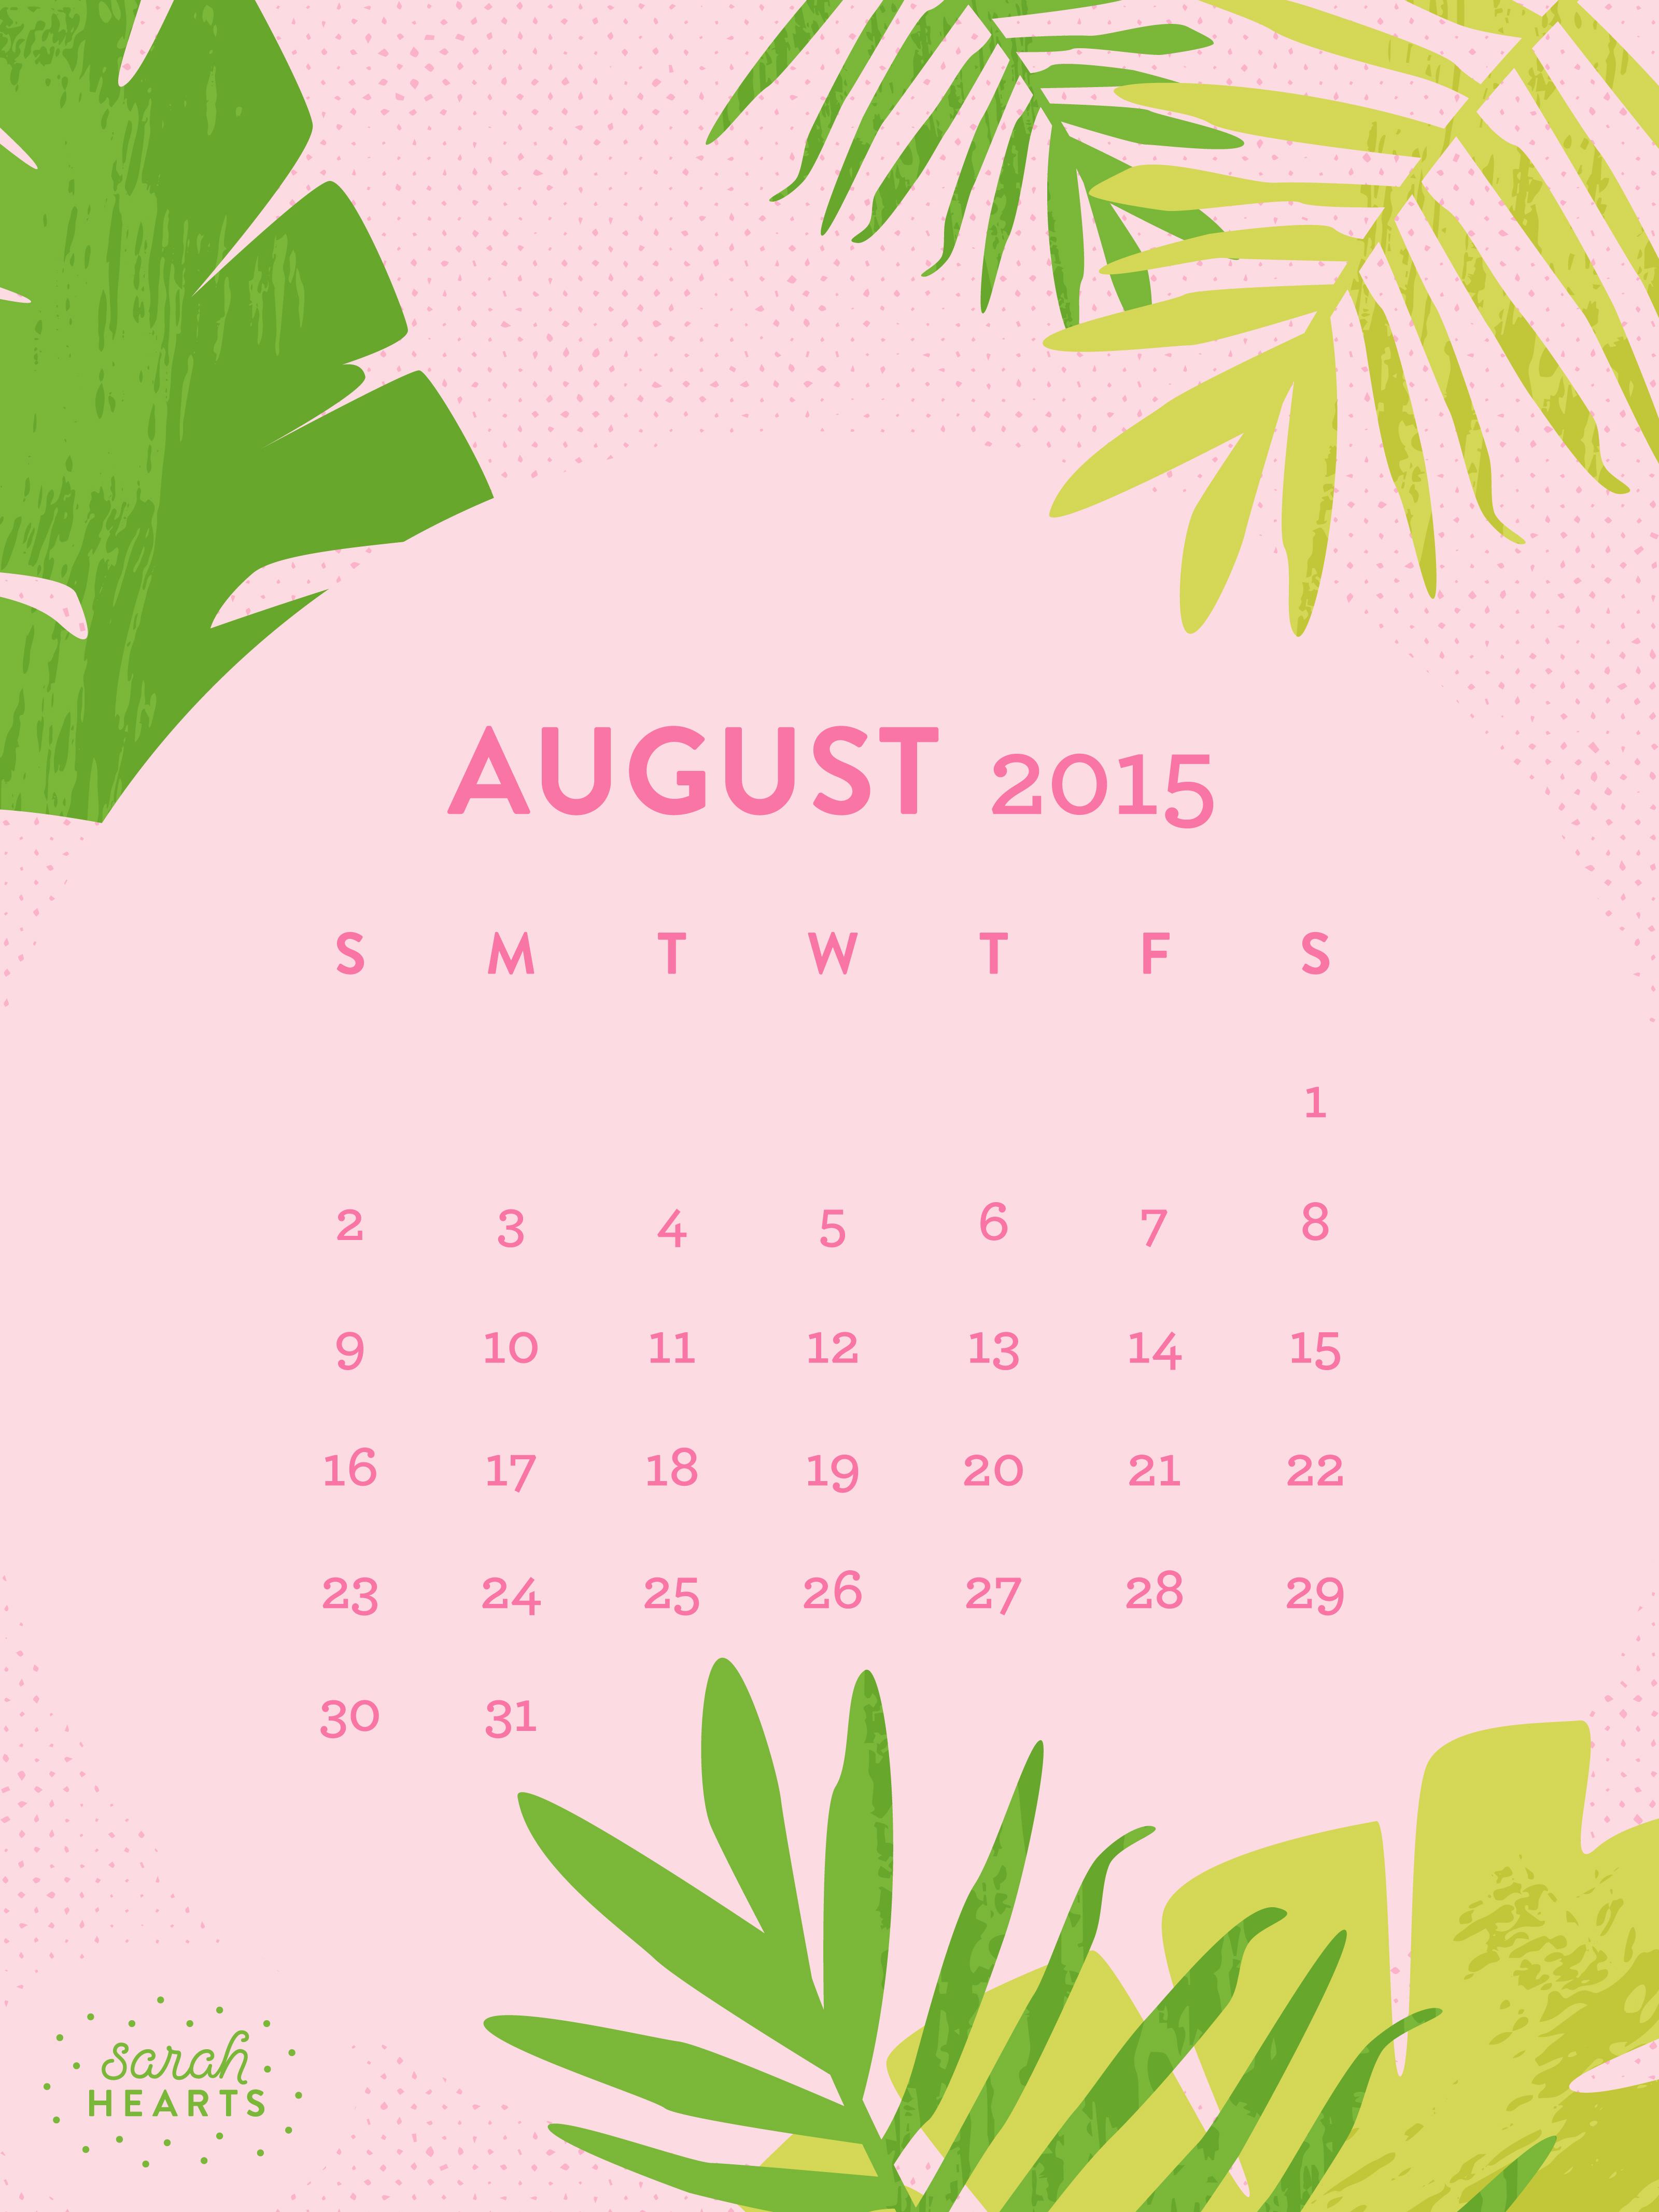 Cute Happy Wallpapers August 2015 Calendar Wallpaper Sarah Hearts